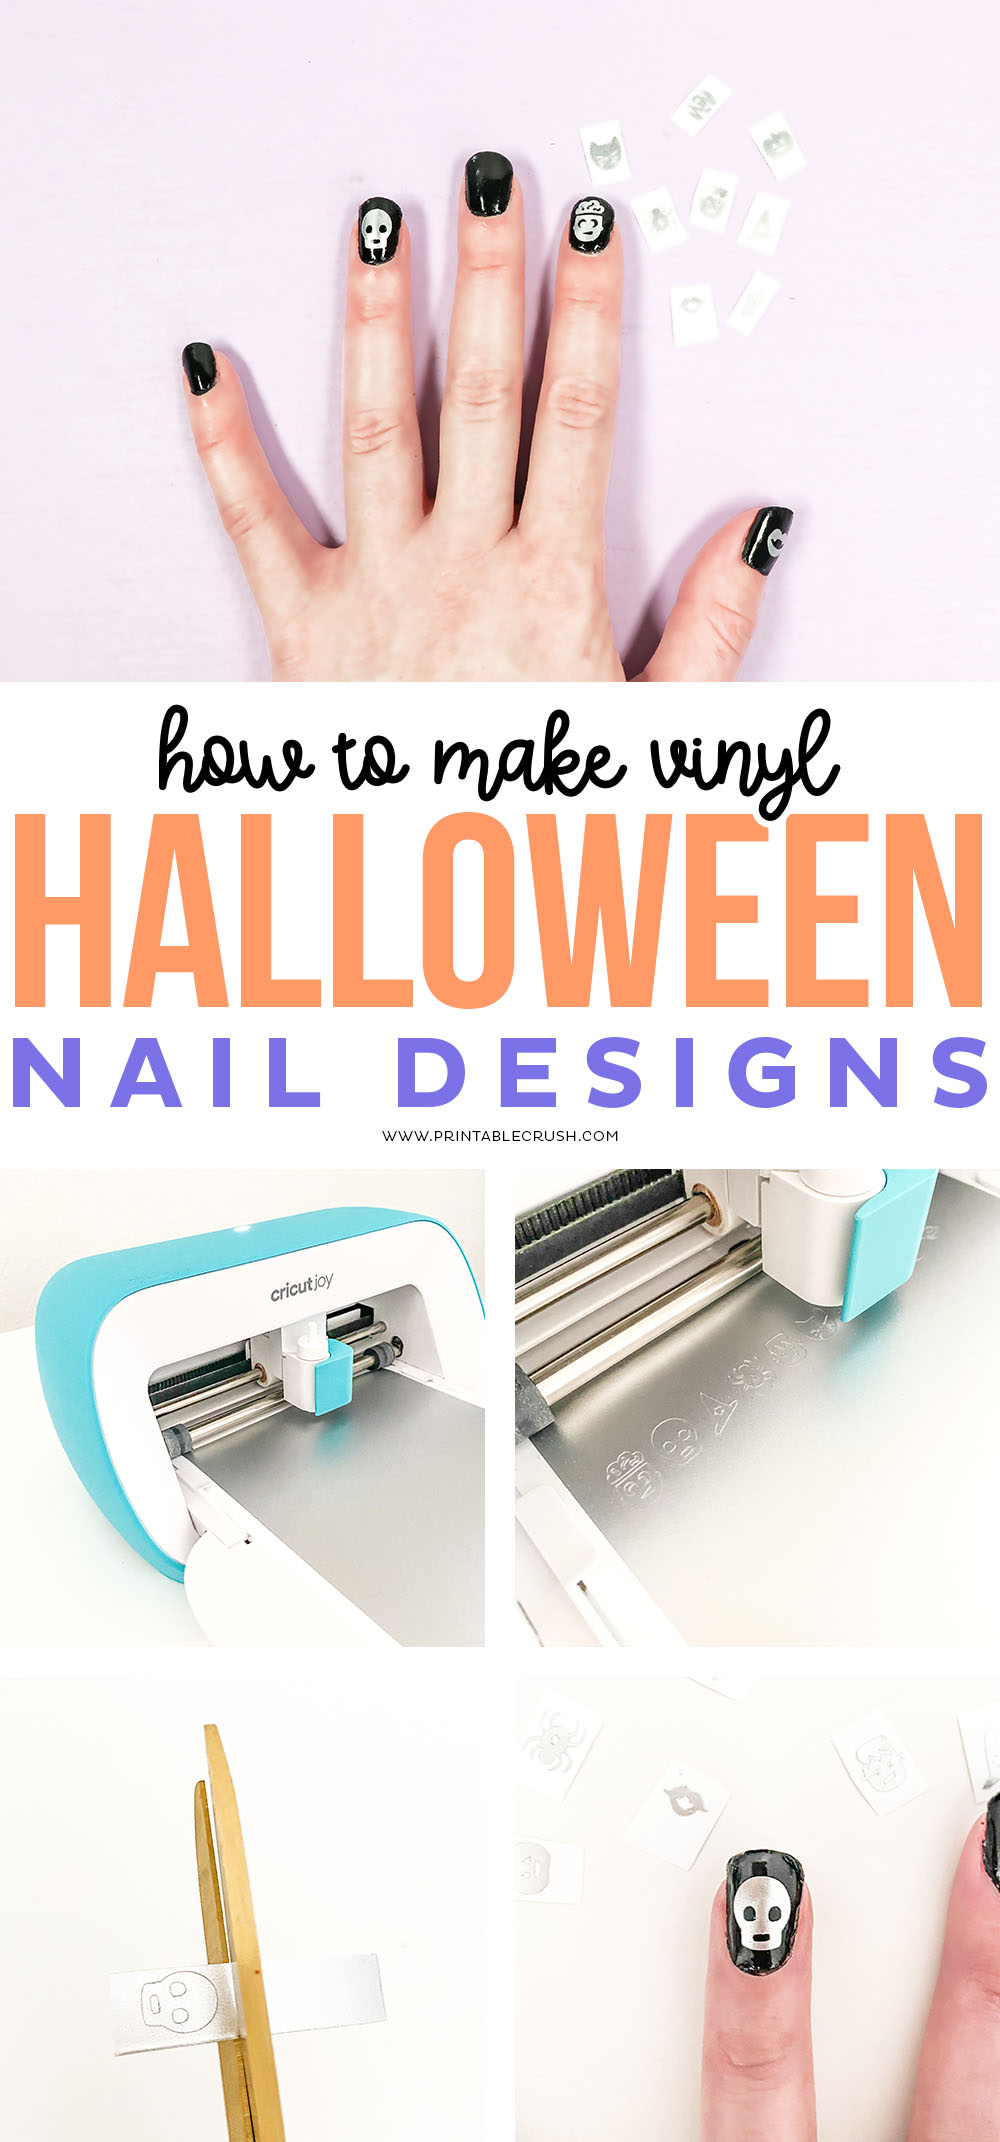 Vinyl Halloween Nail Designs - Printable Crush